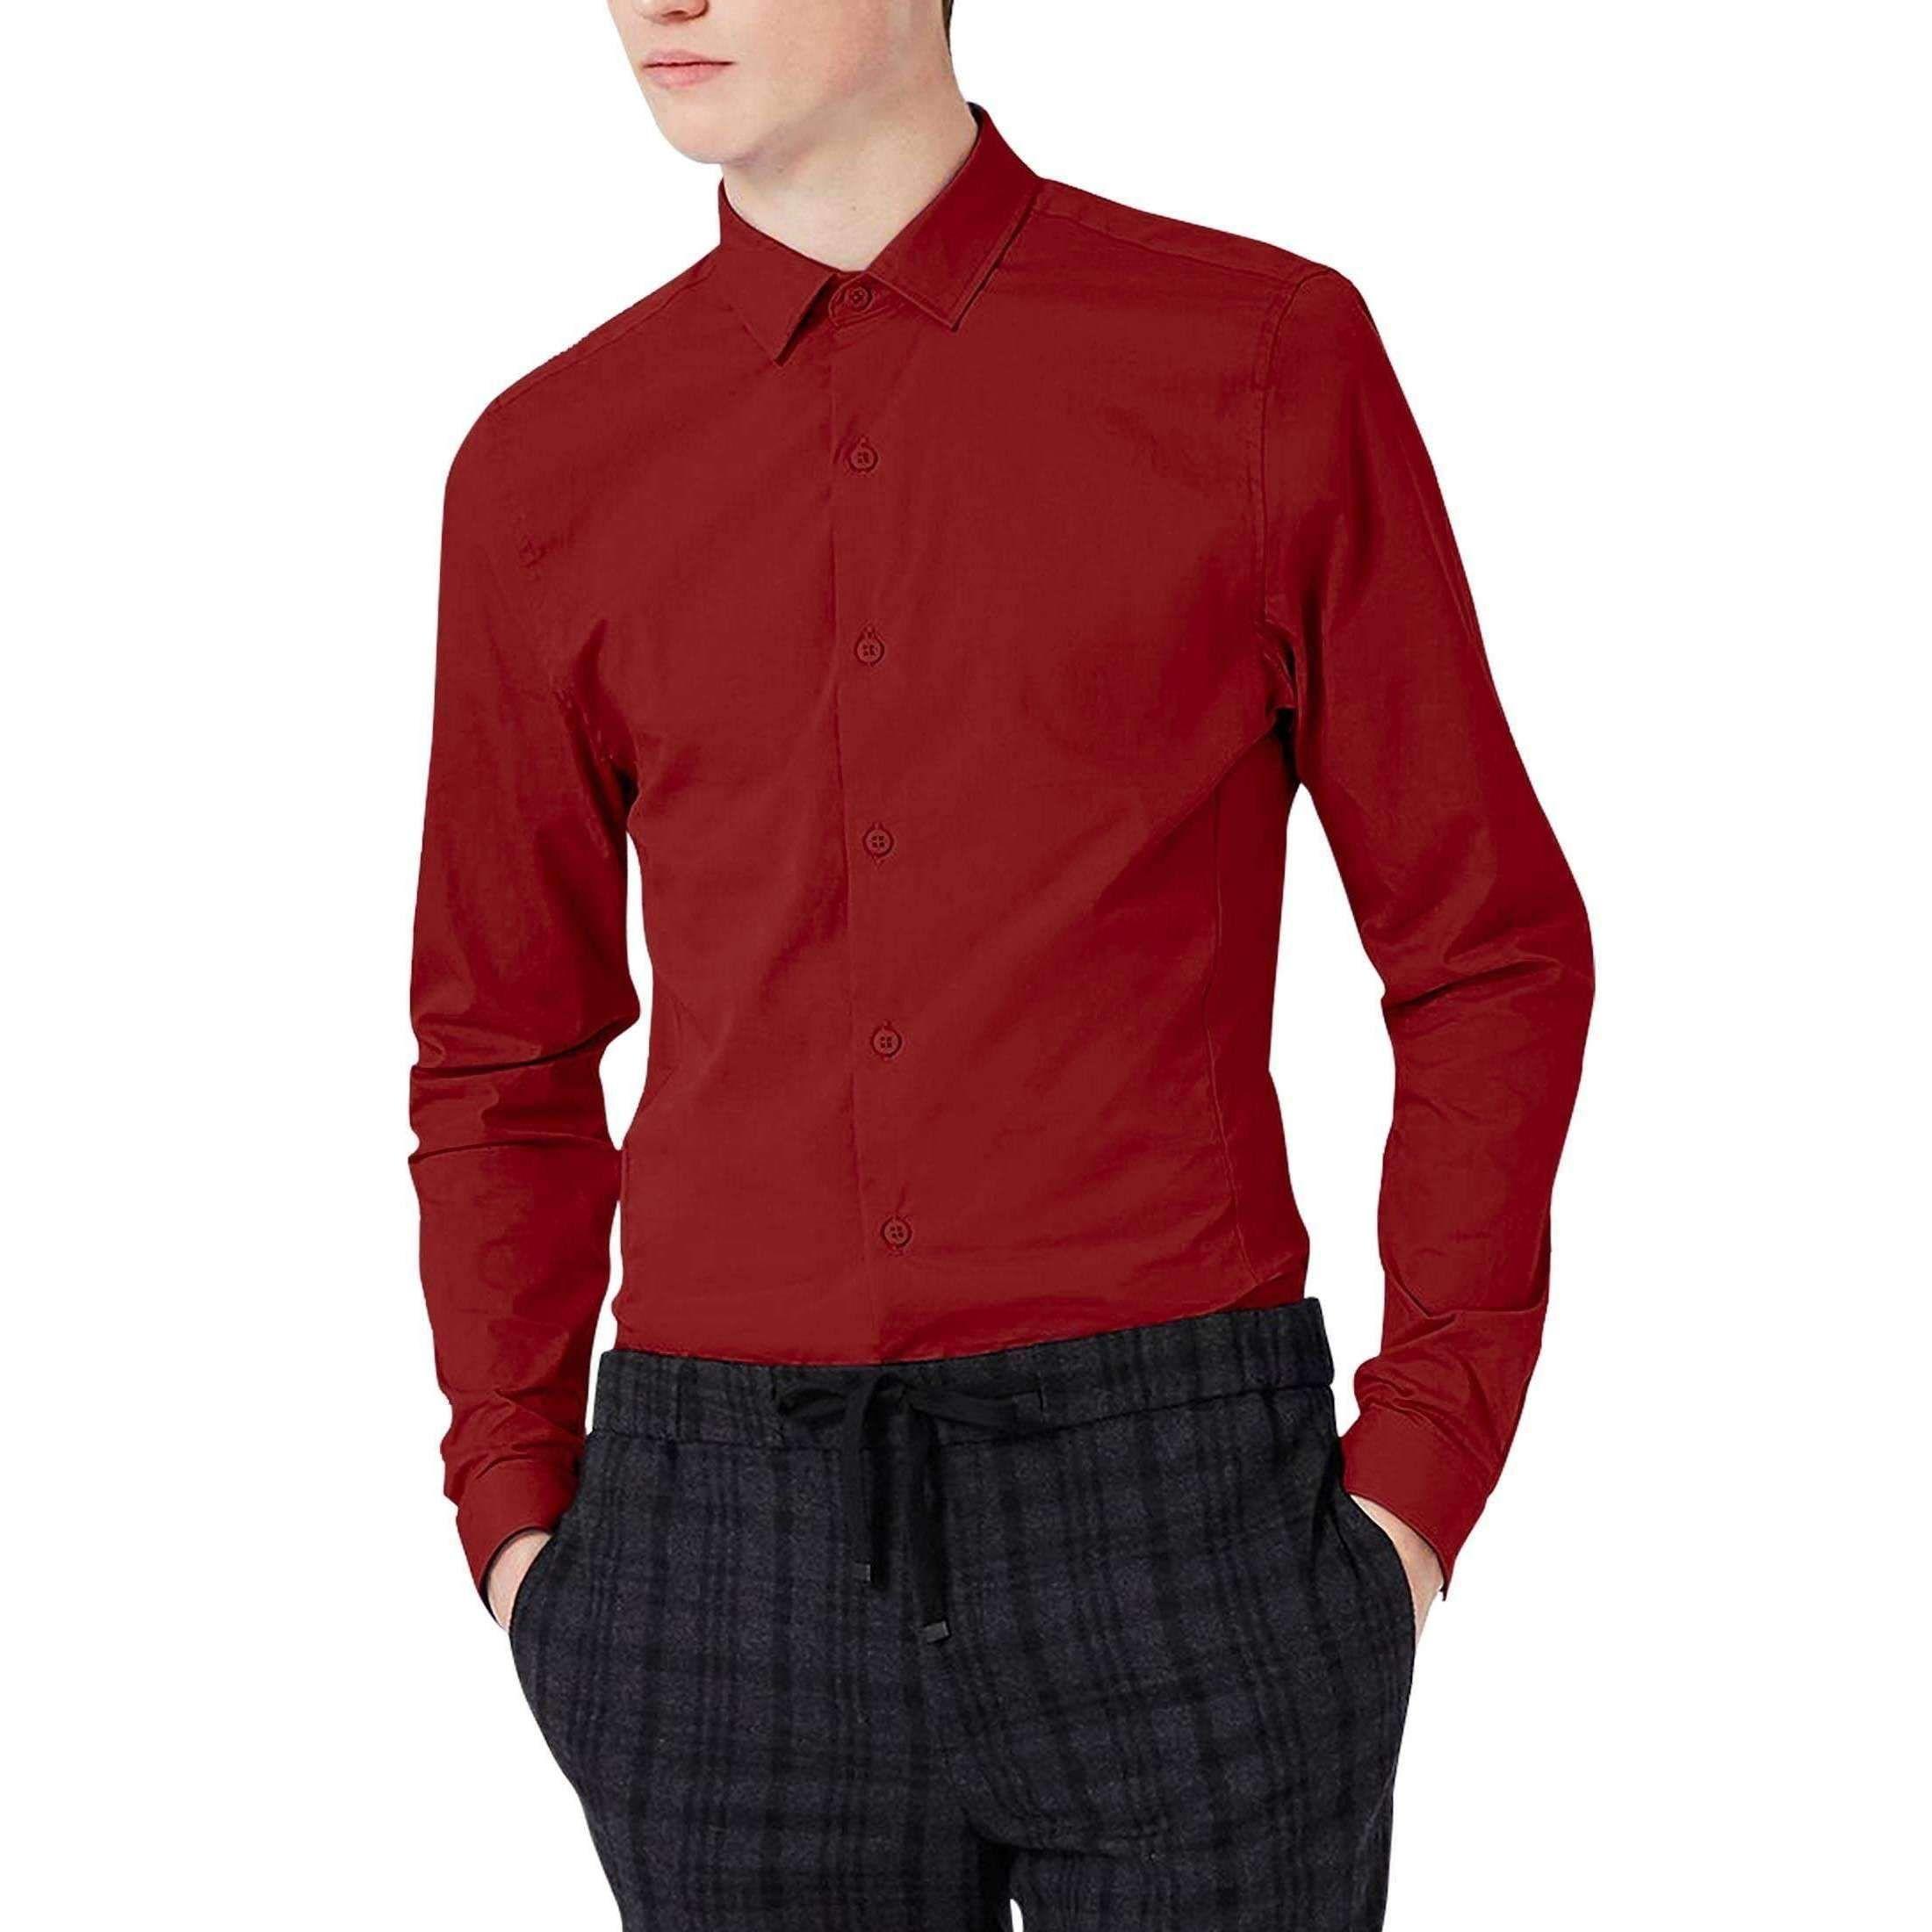 Nr mens slim fit long sleeve dress shirt products